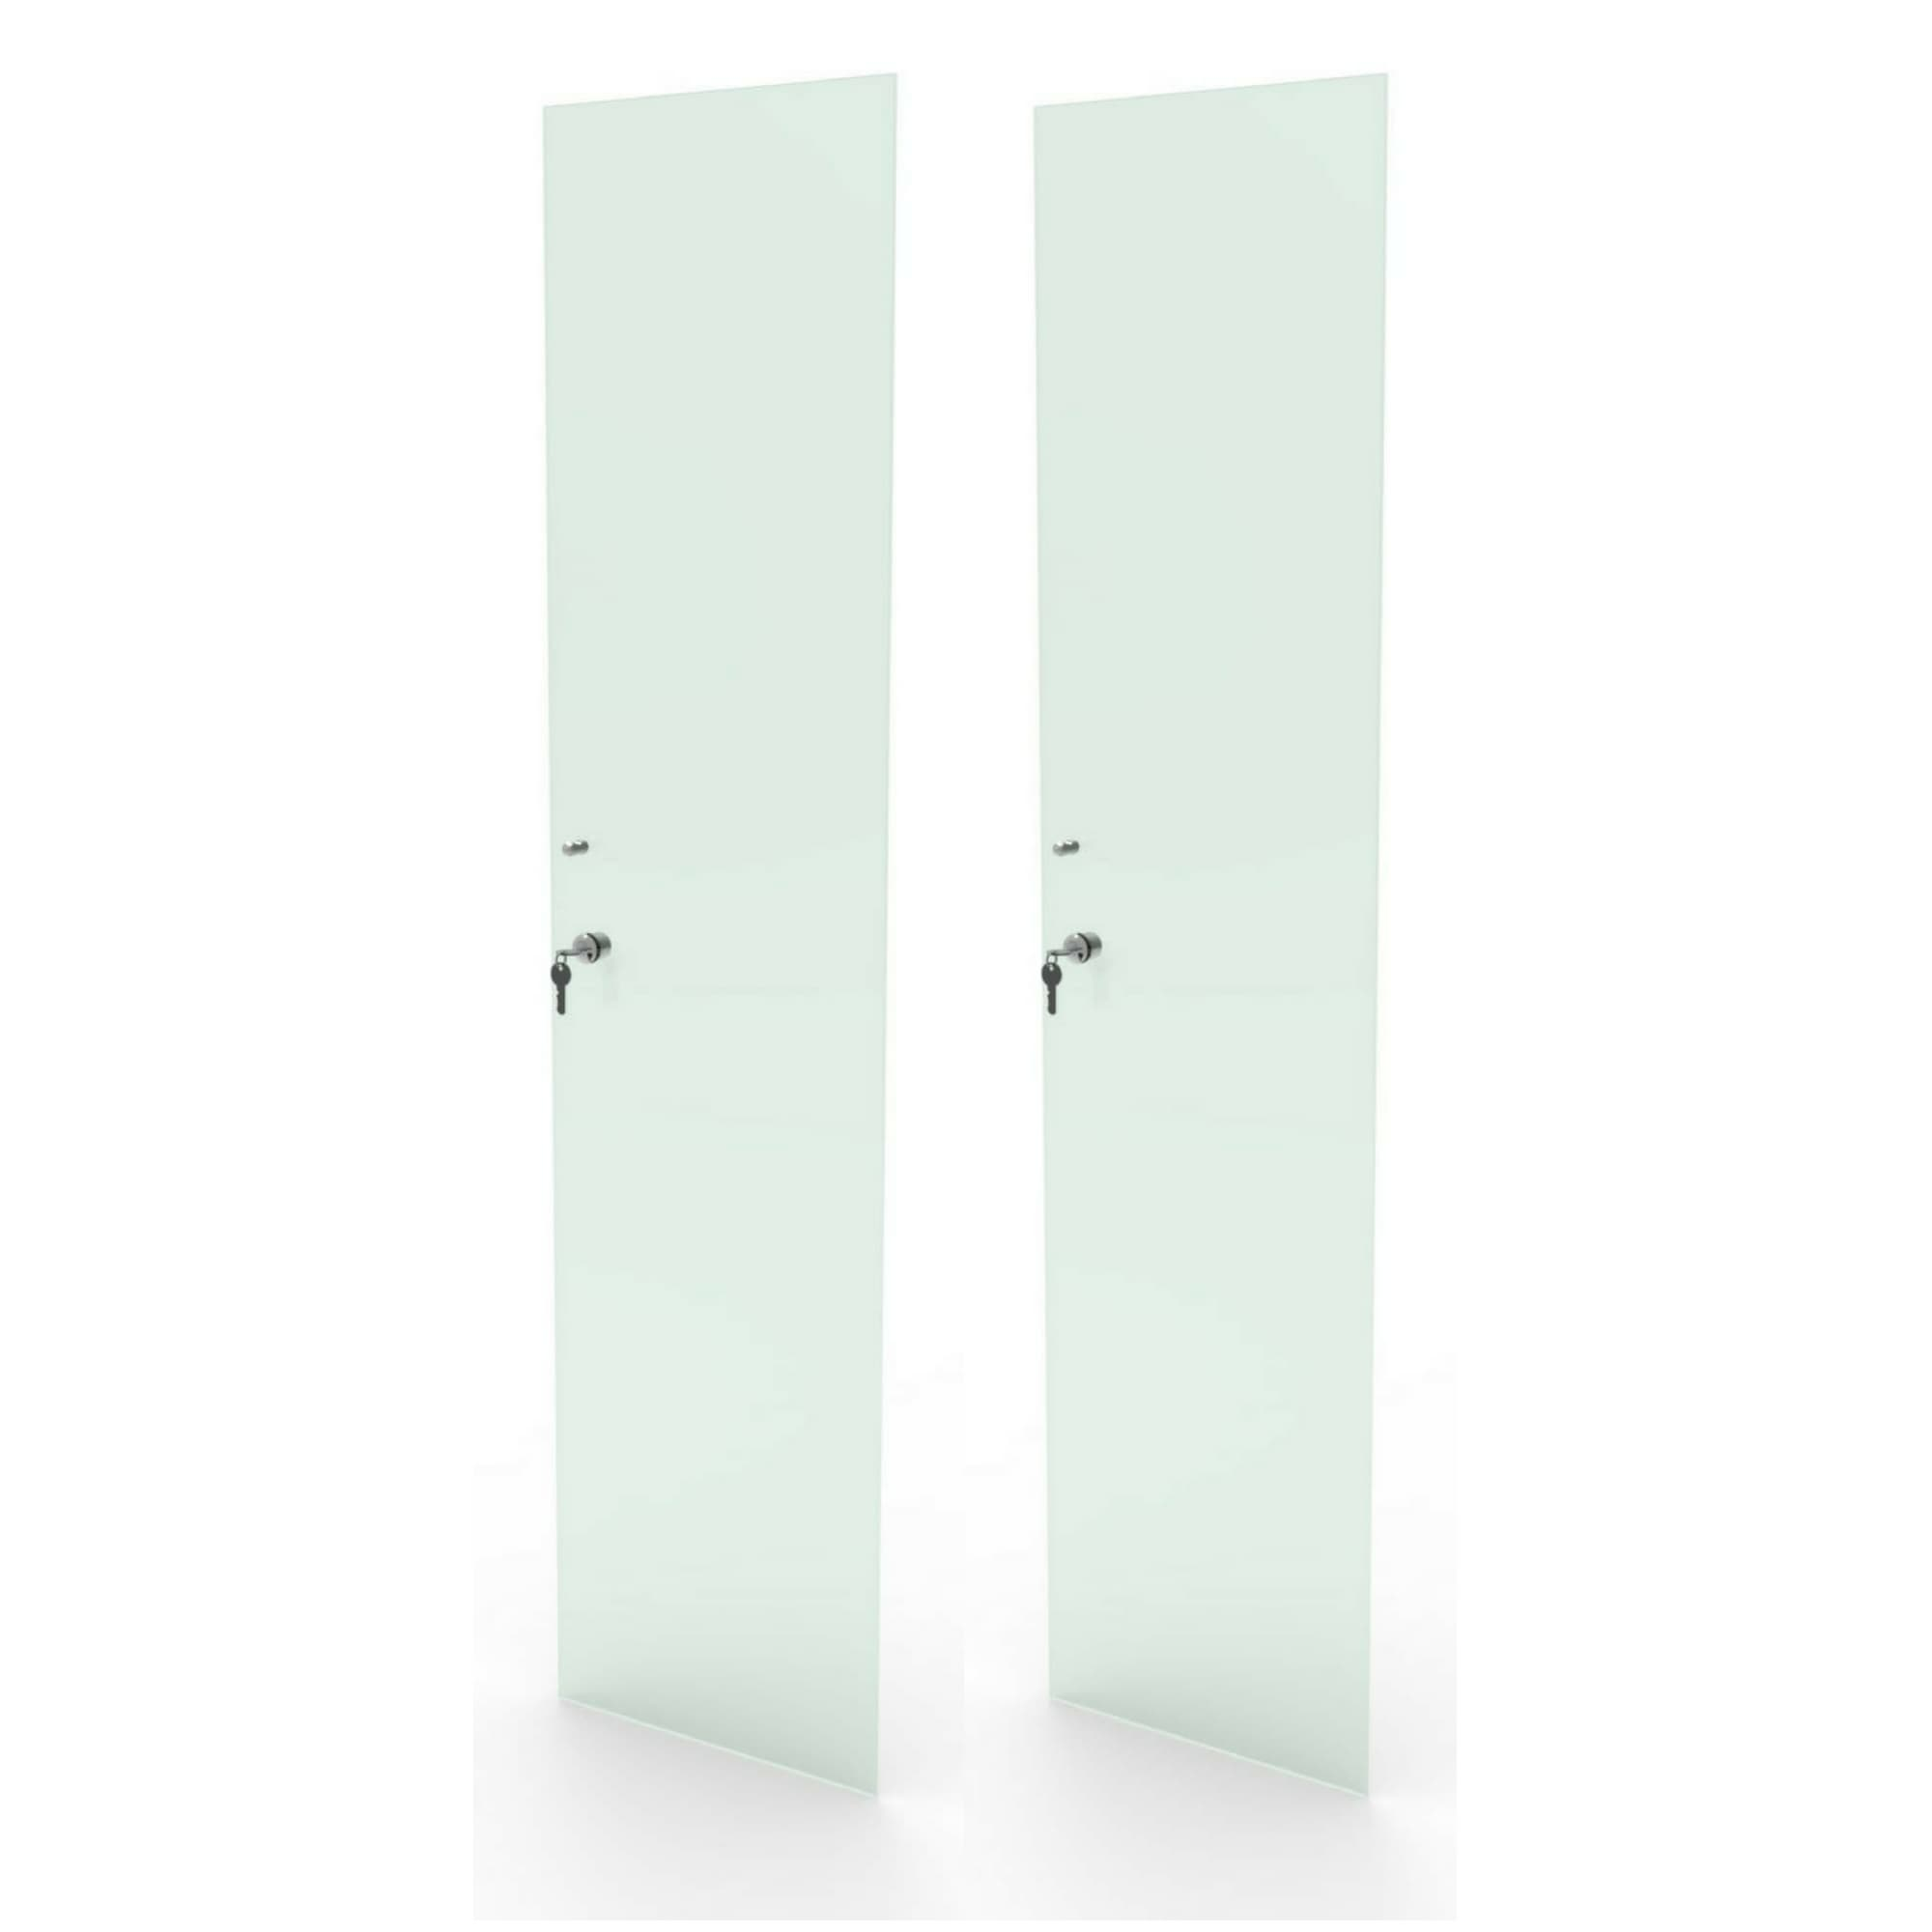 Kit 2 portas de vidro incolor com chave para estante bookcase Bürohaus